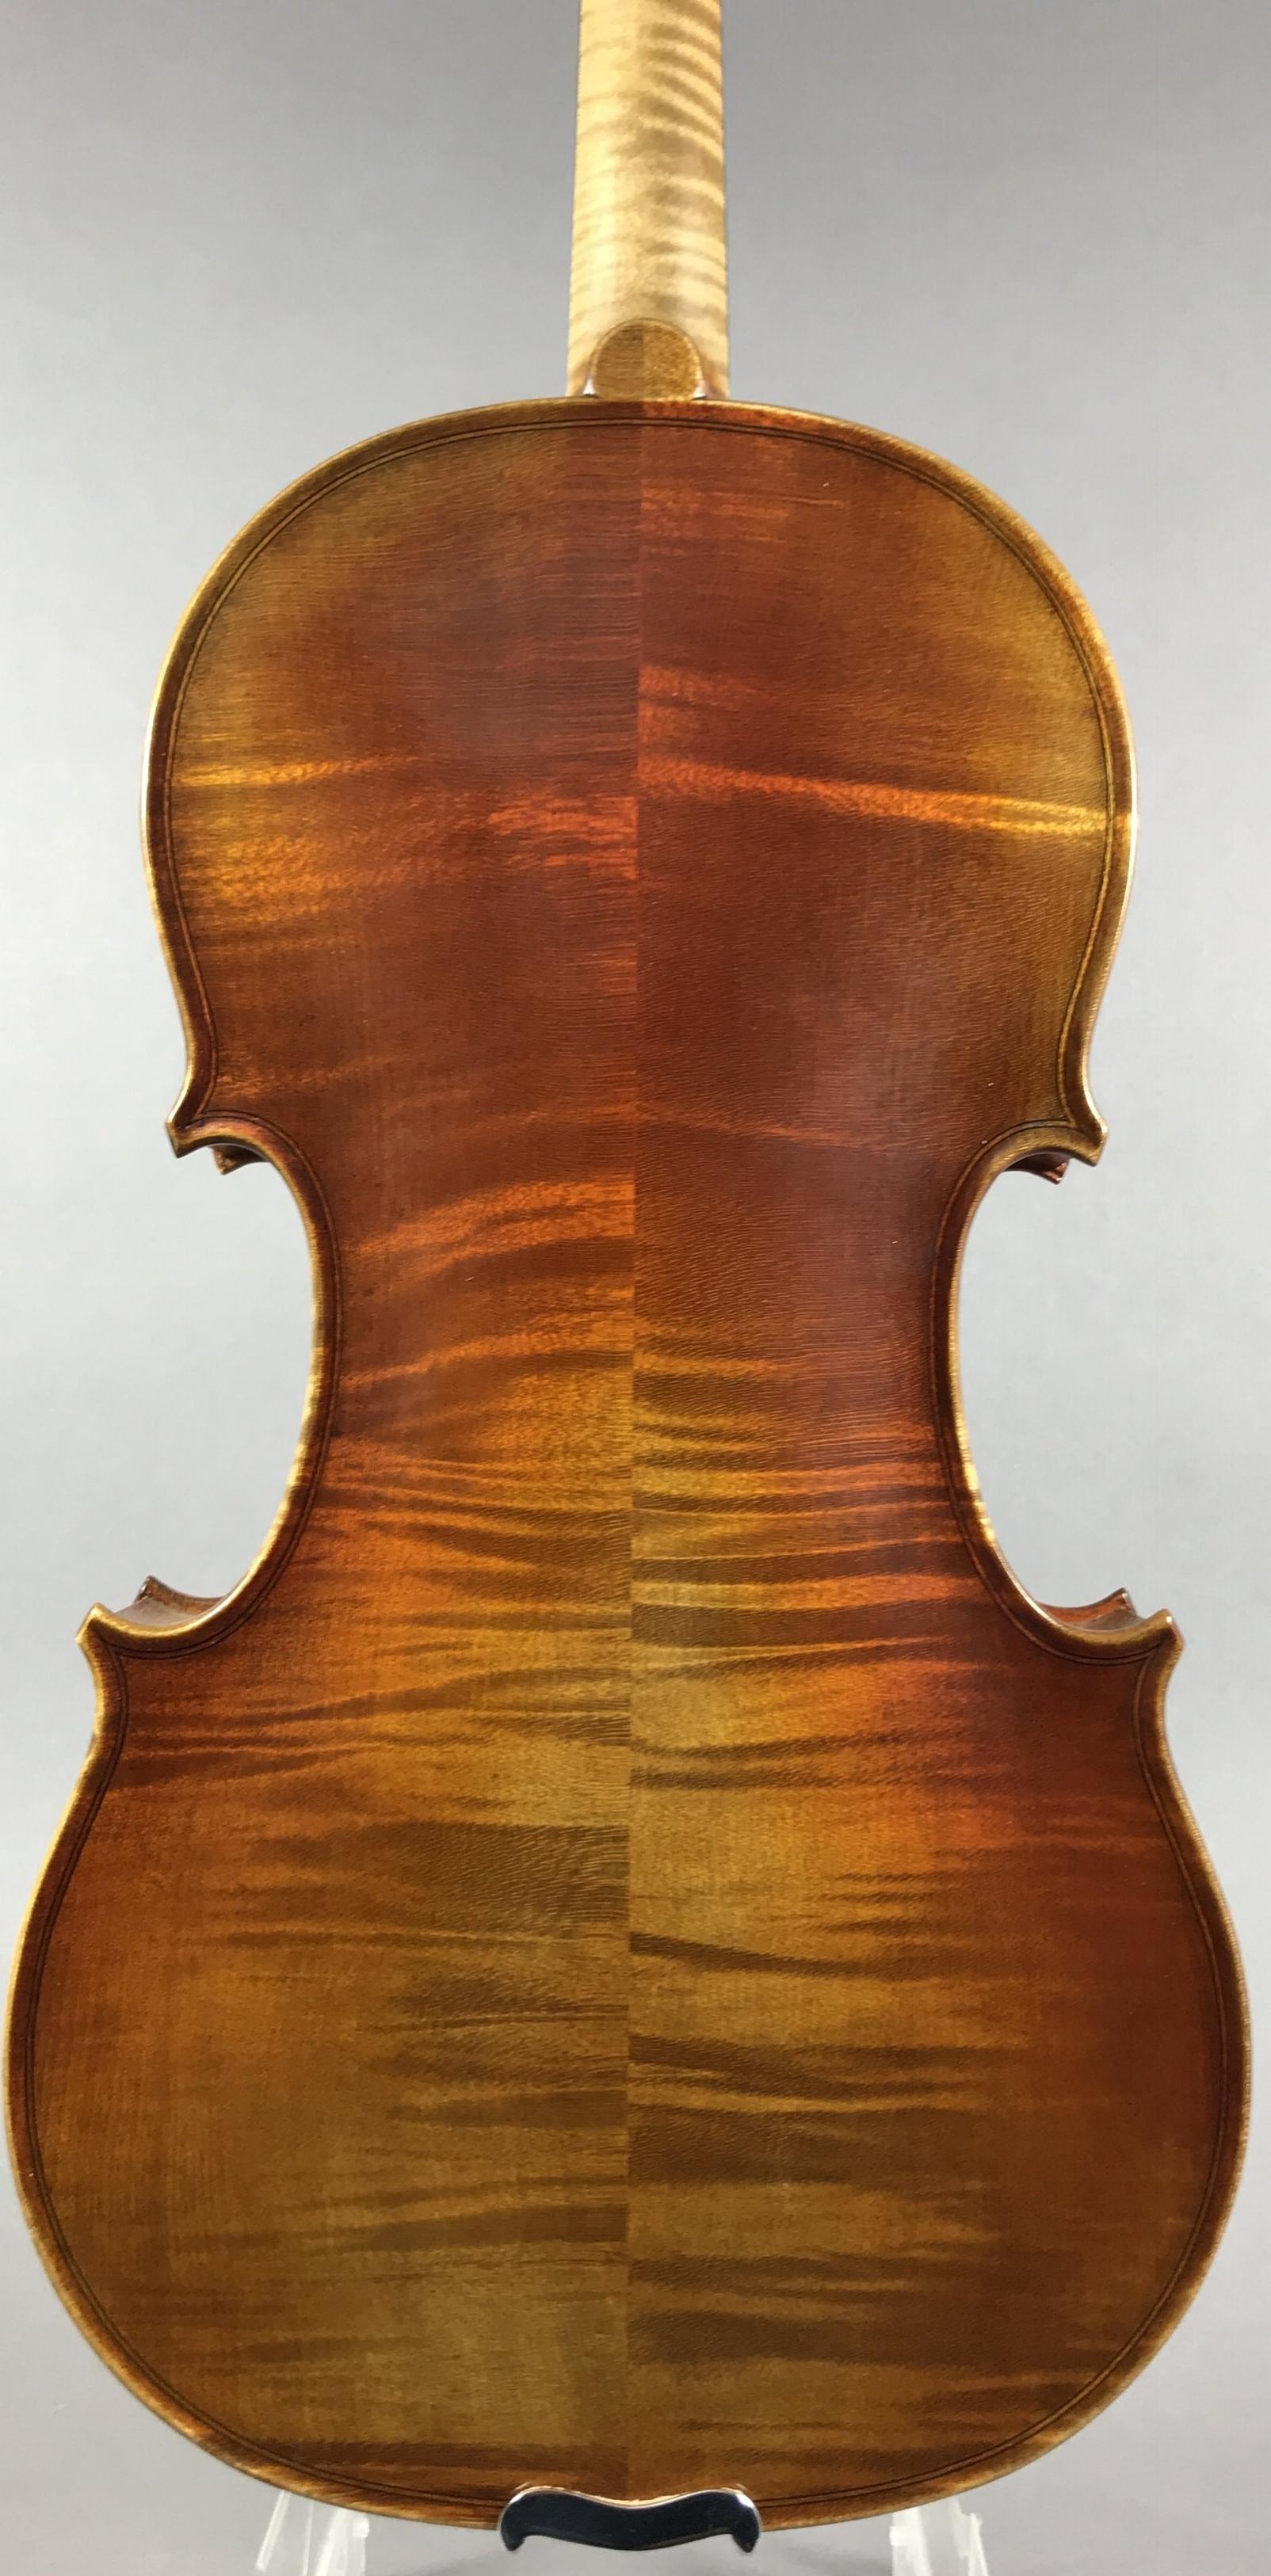 Klaus Heffler, Germany $2,400